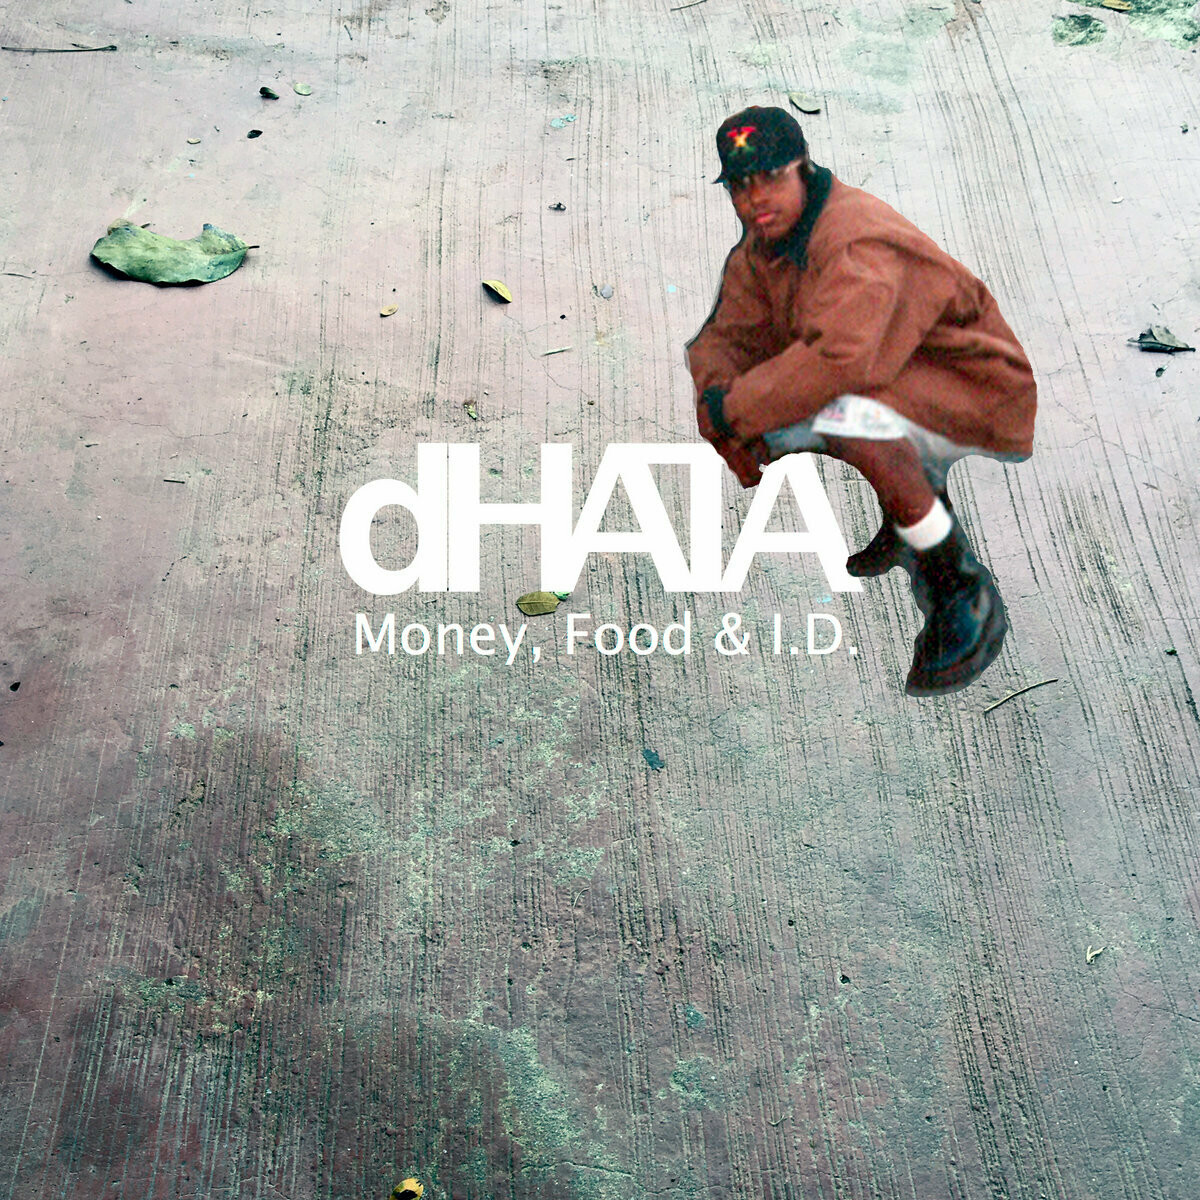 dHATA: Money, Food & I.D.